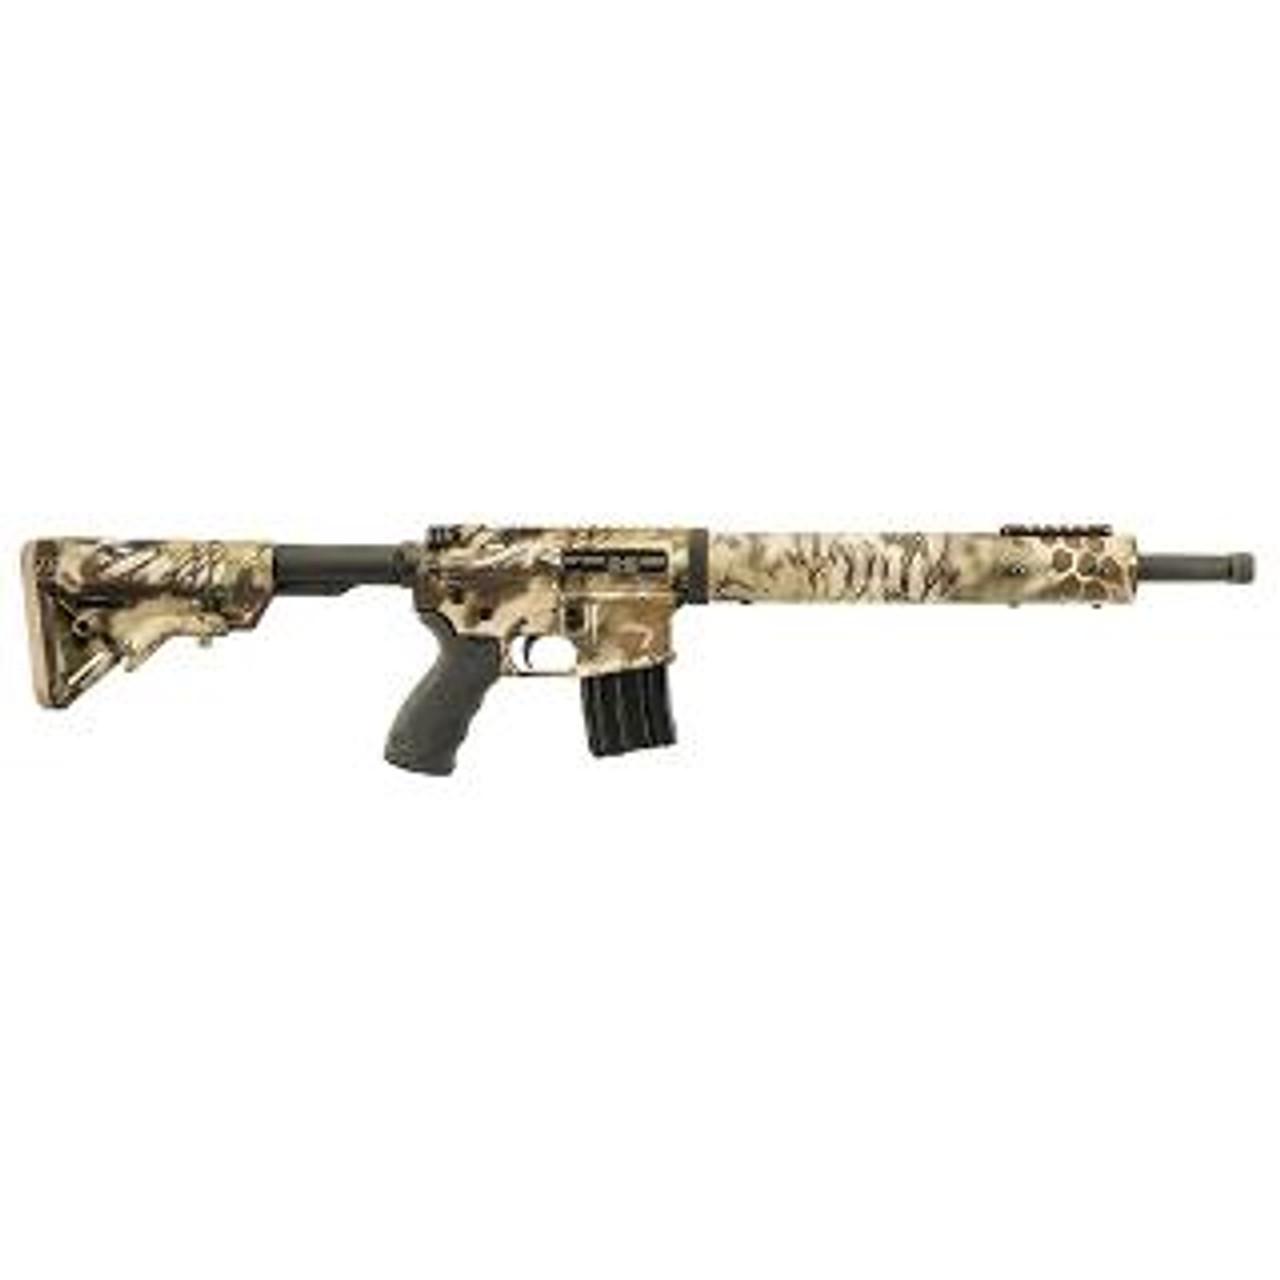 "Alexander Arms Hunter Kryptek Highlander Camo 16.5"" CALIFORNIA LEGAL - .50 Beowulf®"